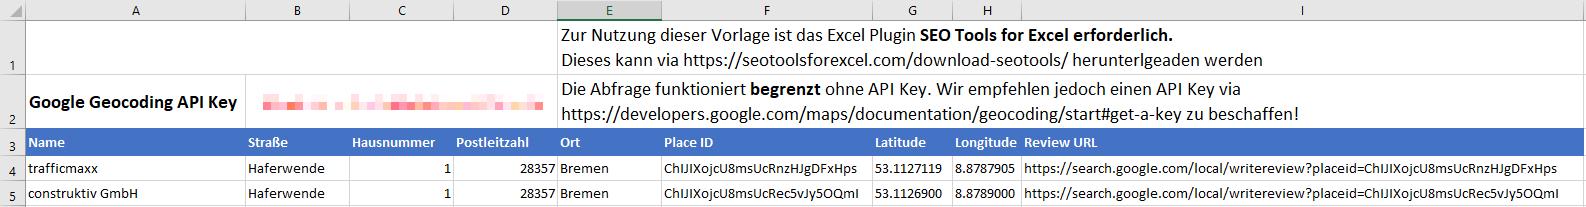 Google Geocoding API SEO Tools for Excel Vorlage